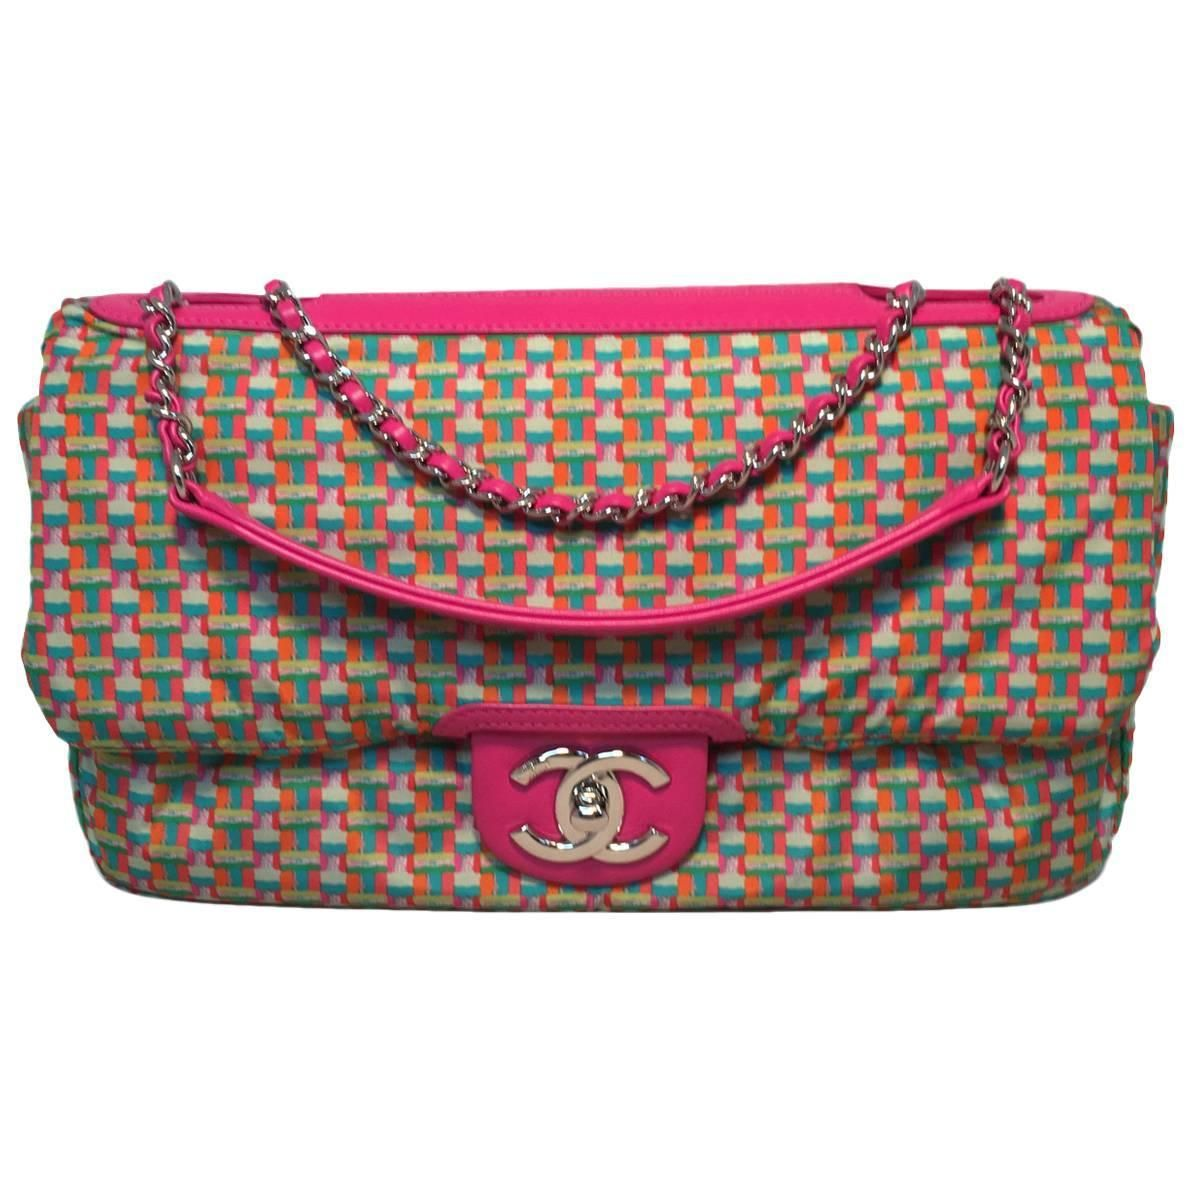 c2d5360a0e4c Chanel Pink Rubber Raincoat Classic Flap Shoulder Bag